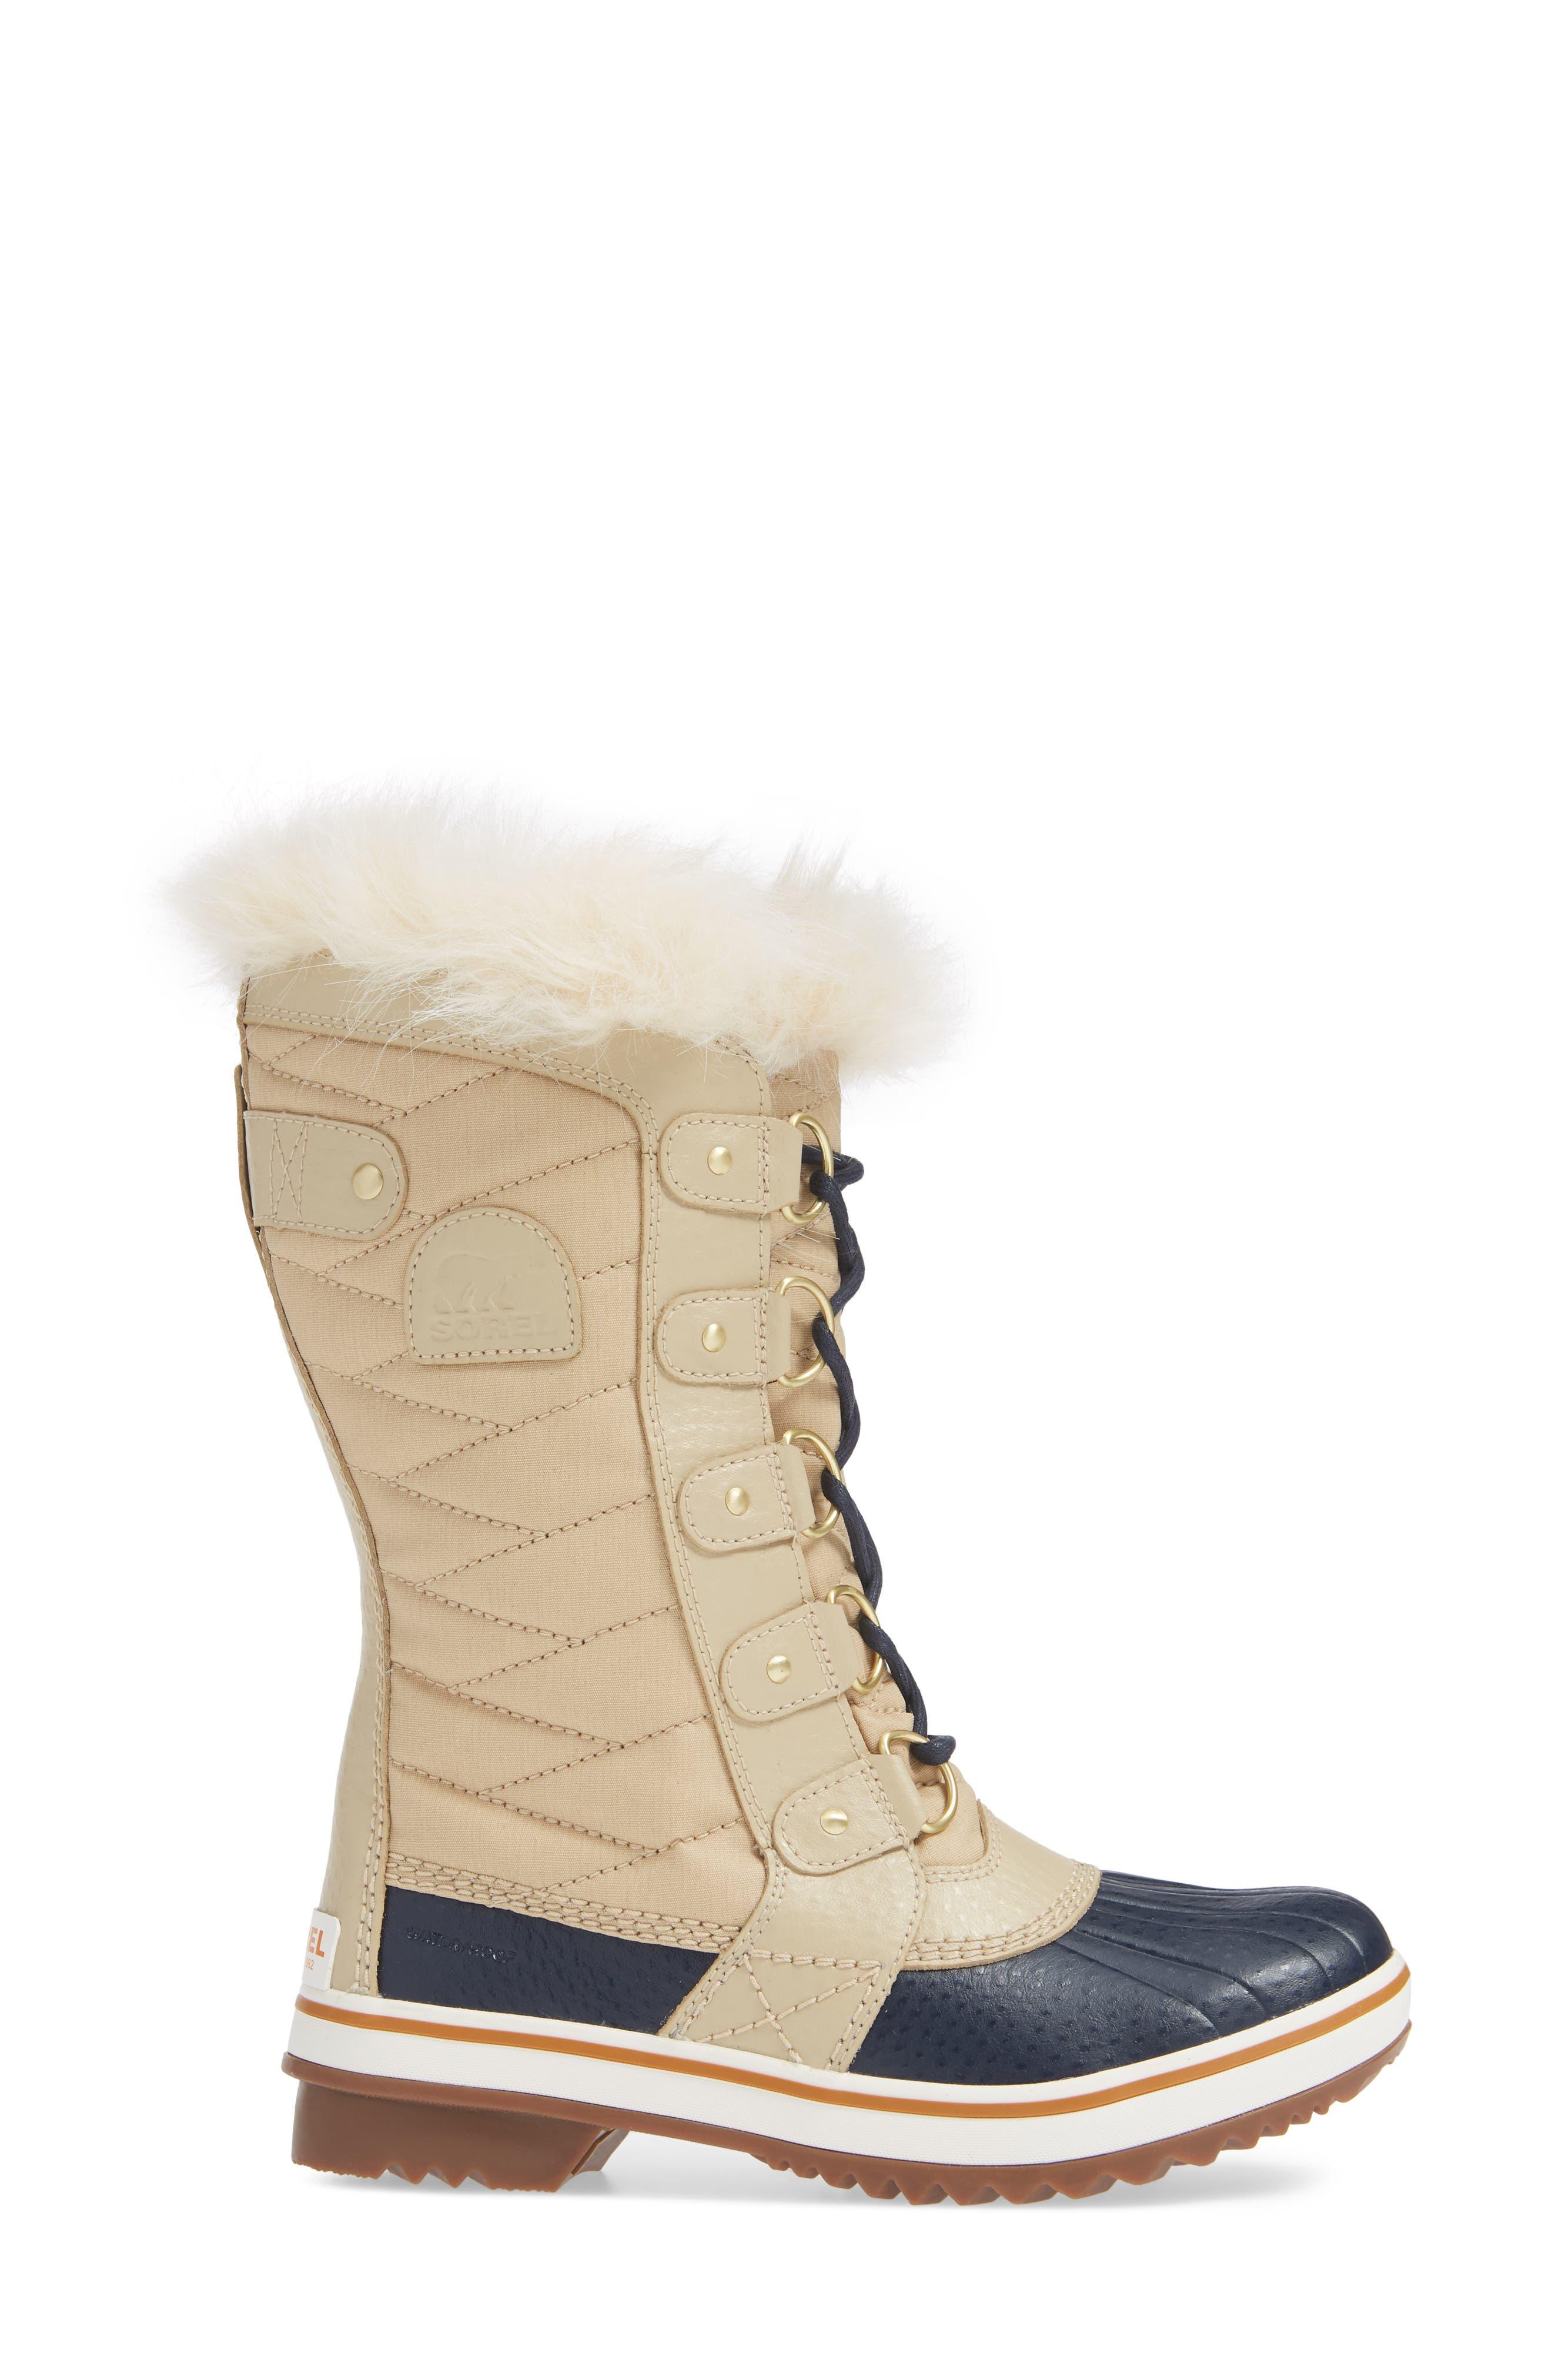 'Tofino II' Faux Fur Lined Waterproof Boot,                             Alternate thumbnail 3, color,                             OATMEAL